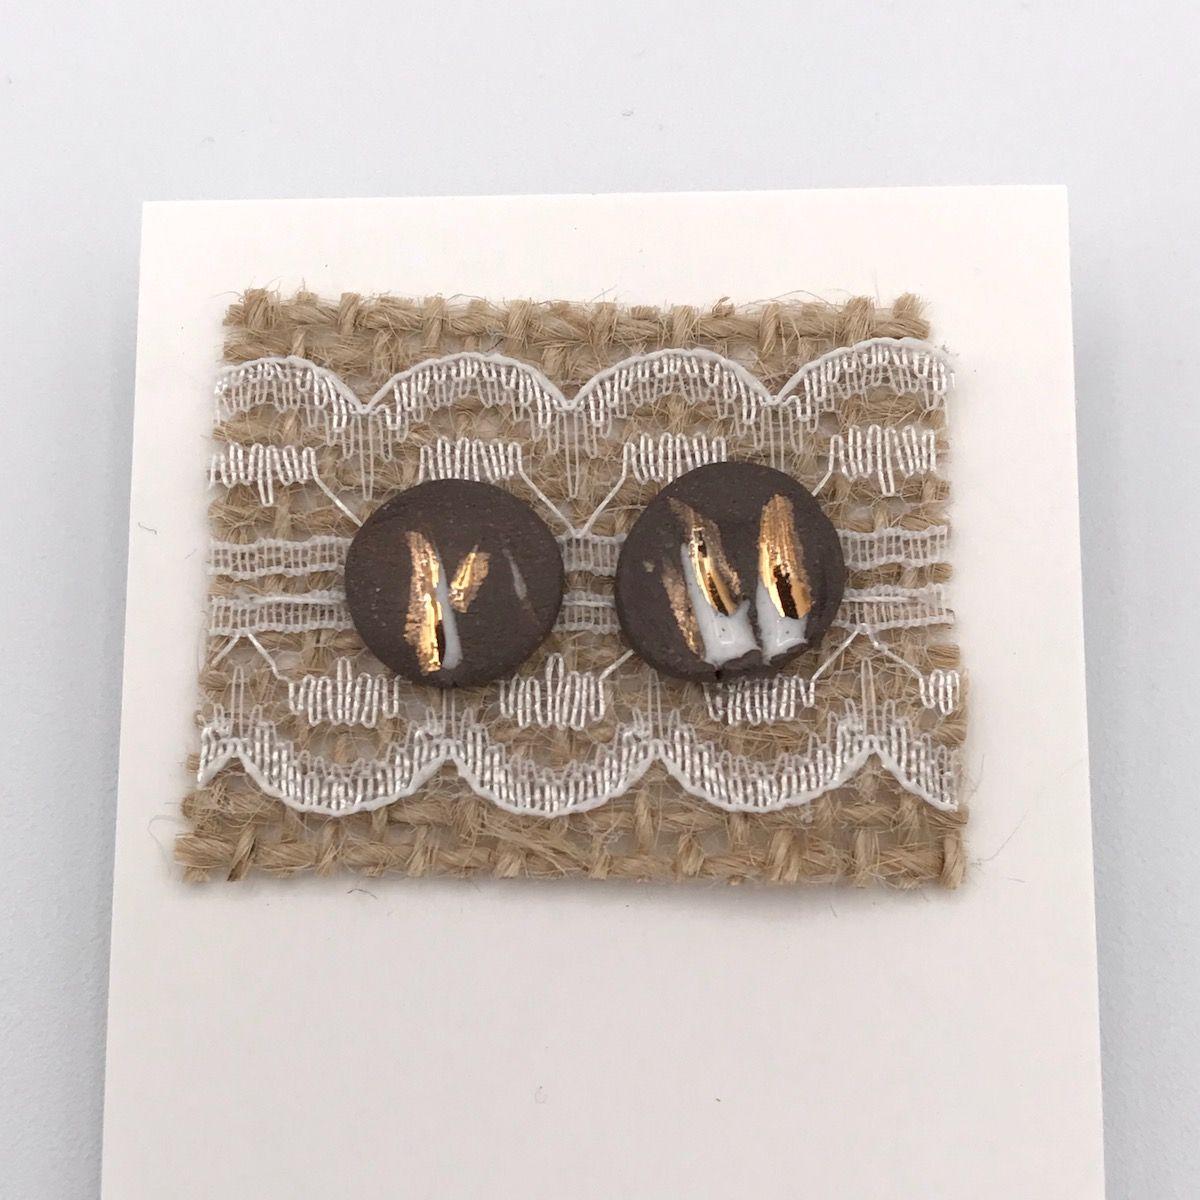 Oat Imprint & Gold Stud Earrings